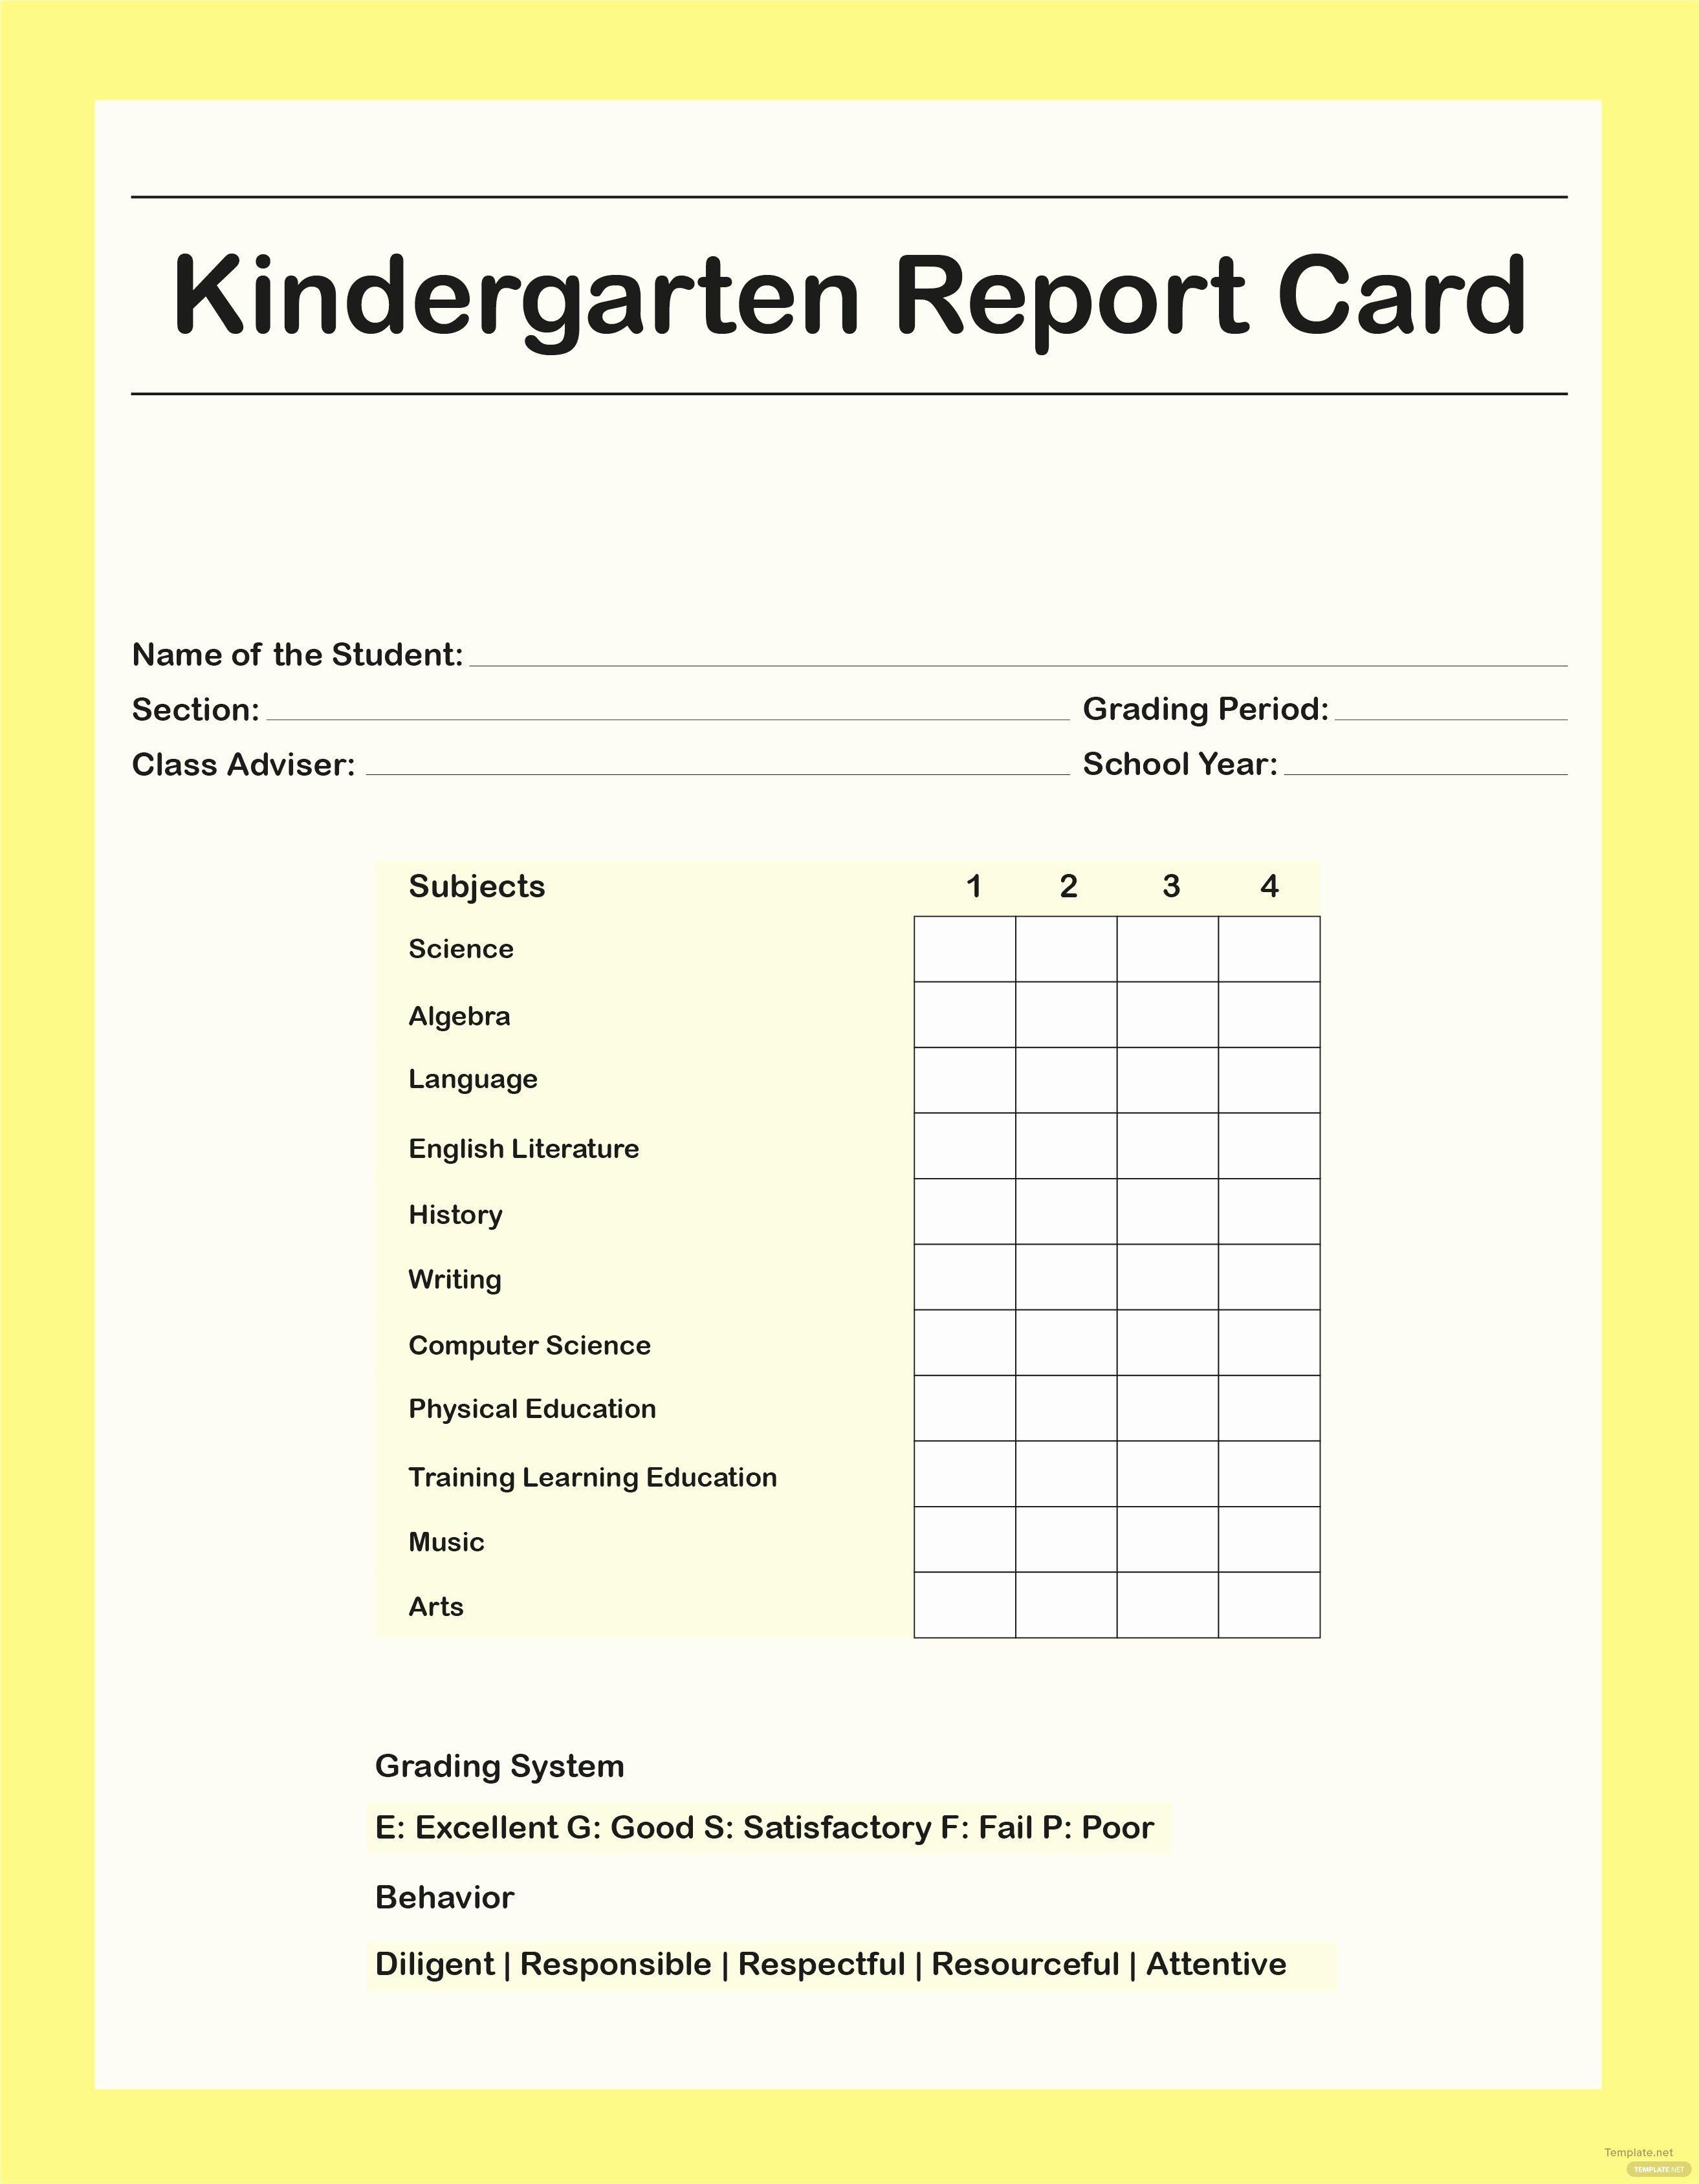 Report Card Templates Free Fresh Free Kindergarten Report Card Template In Adobe Shop